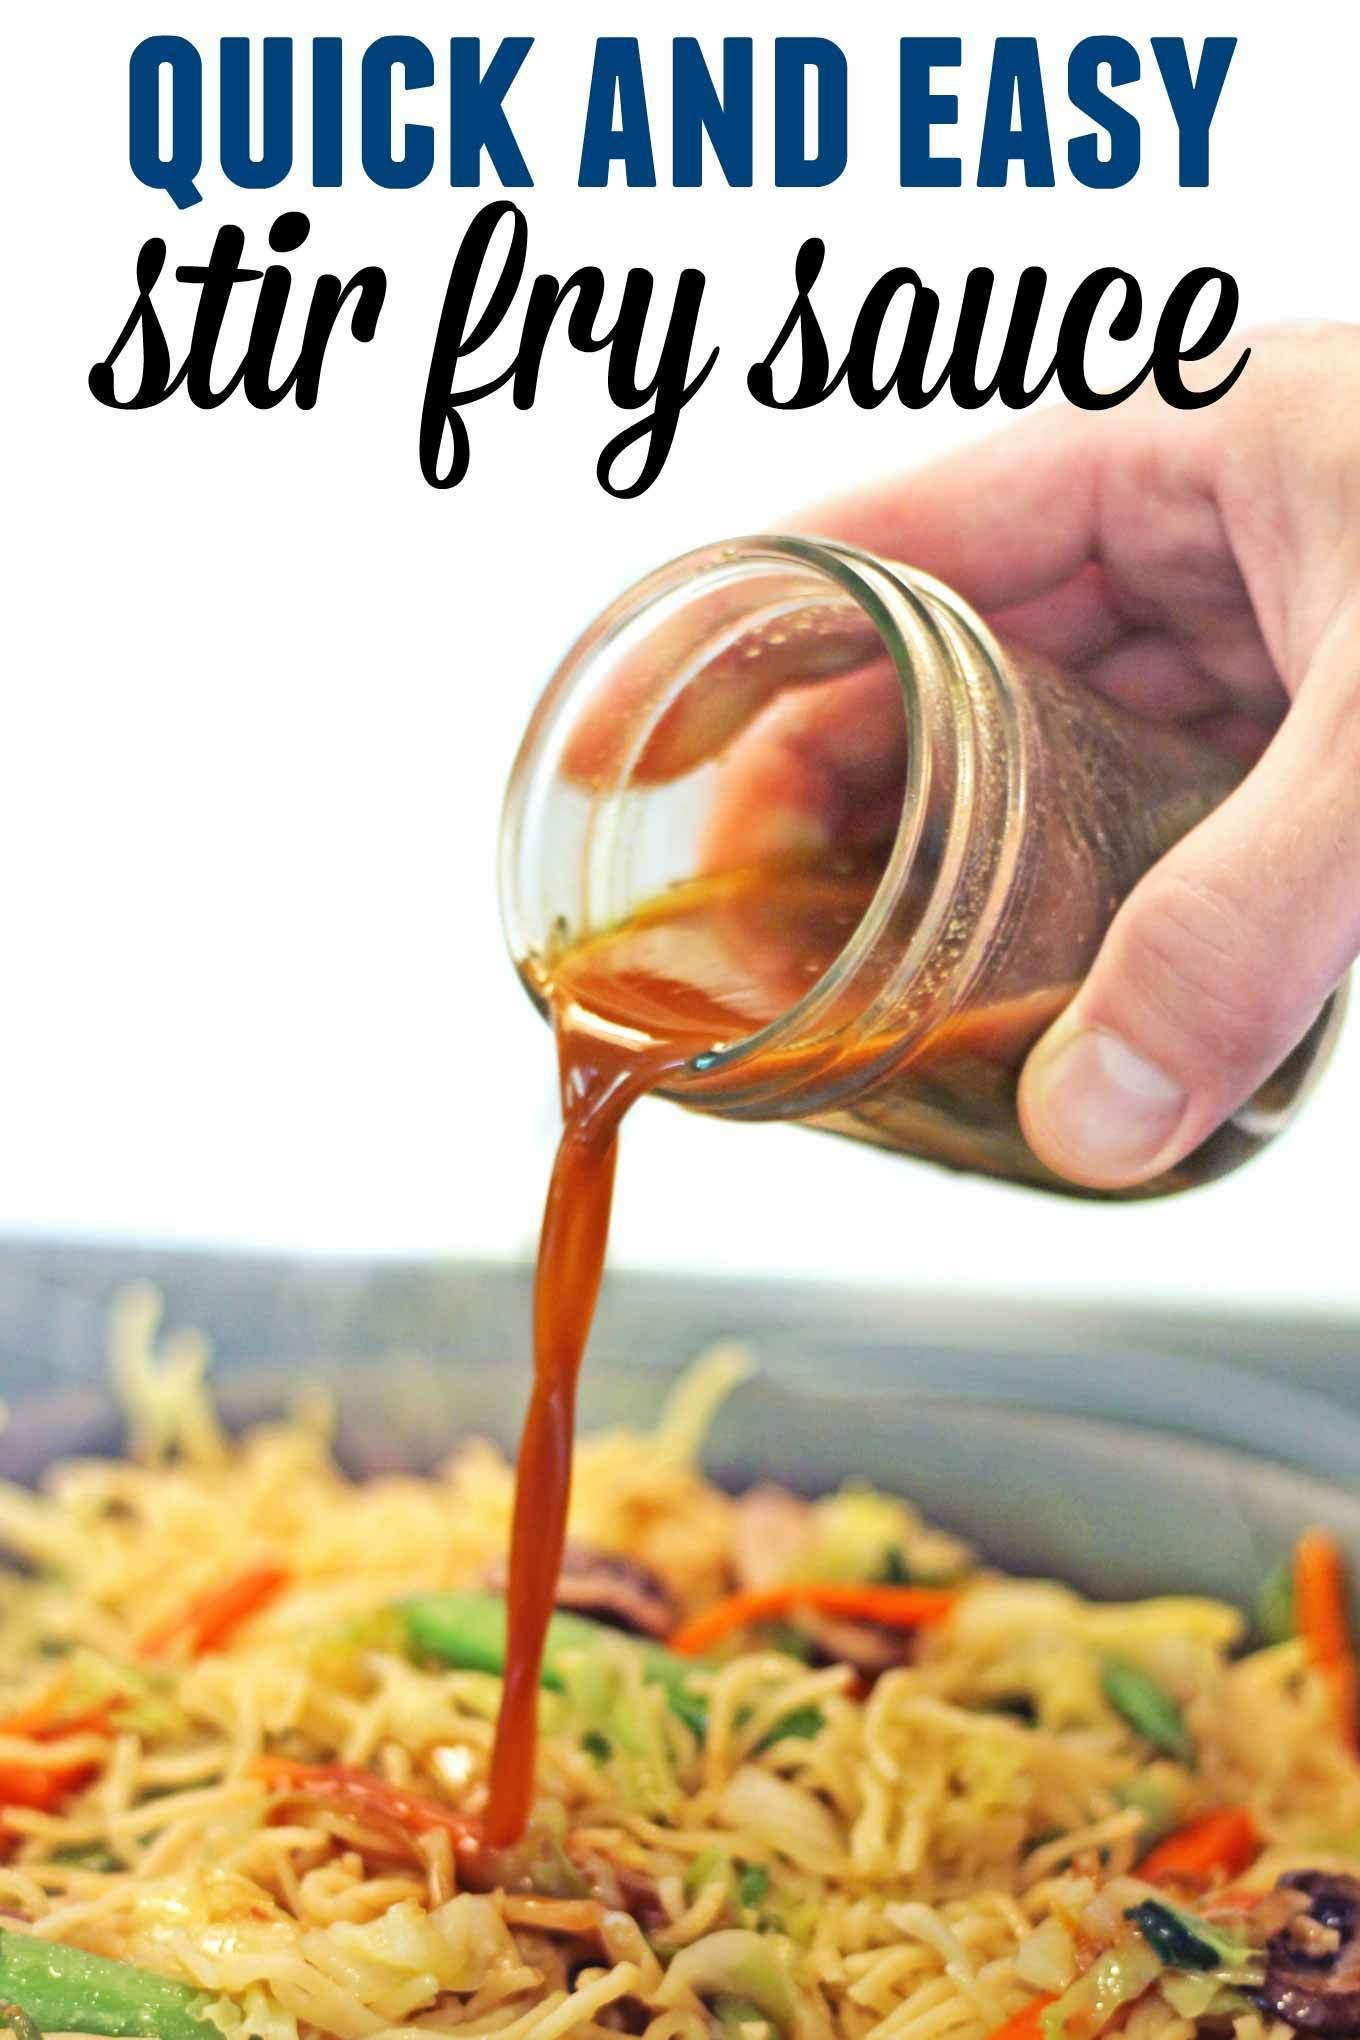 Easy stir fry sauce #healthystirfry